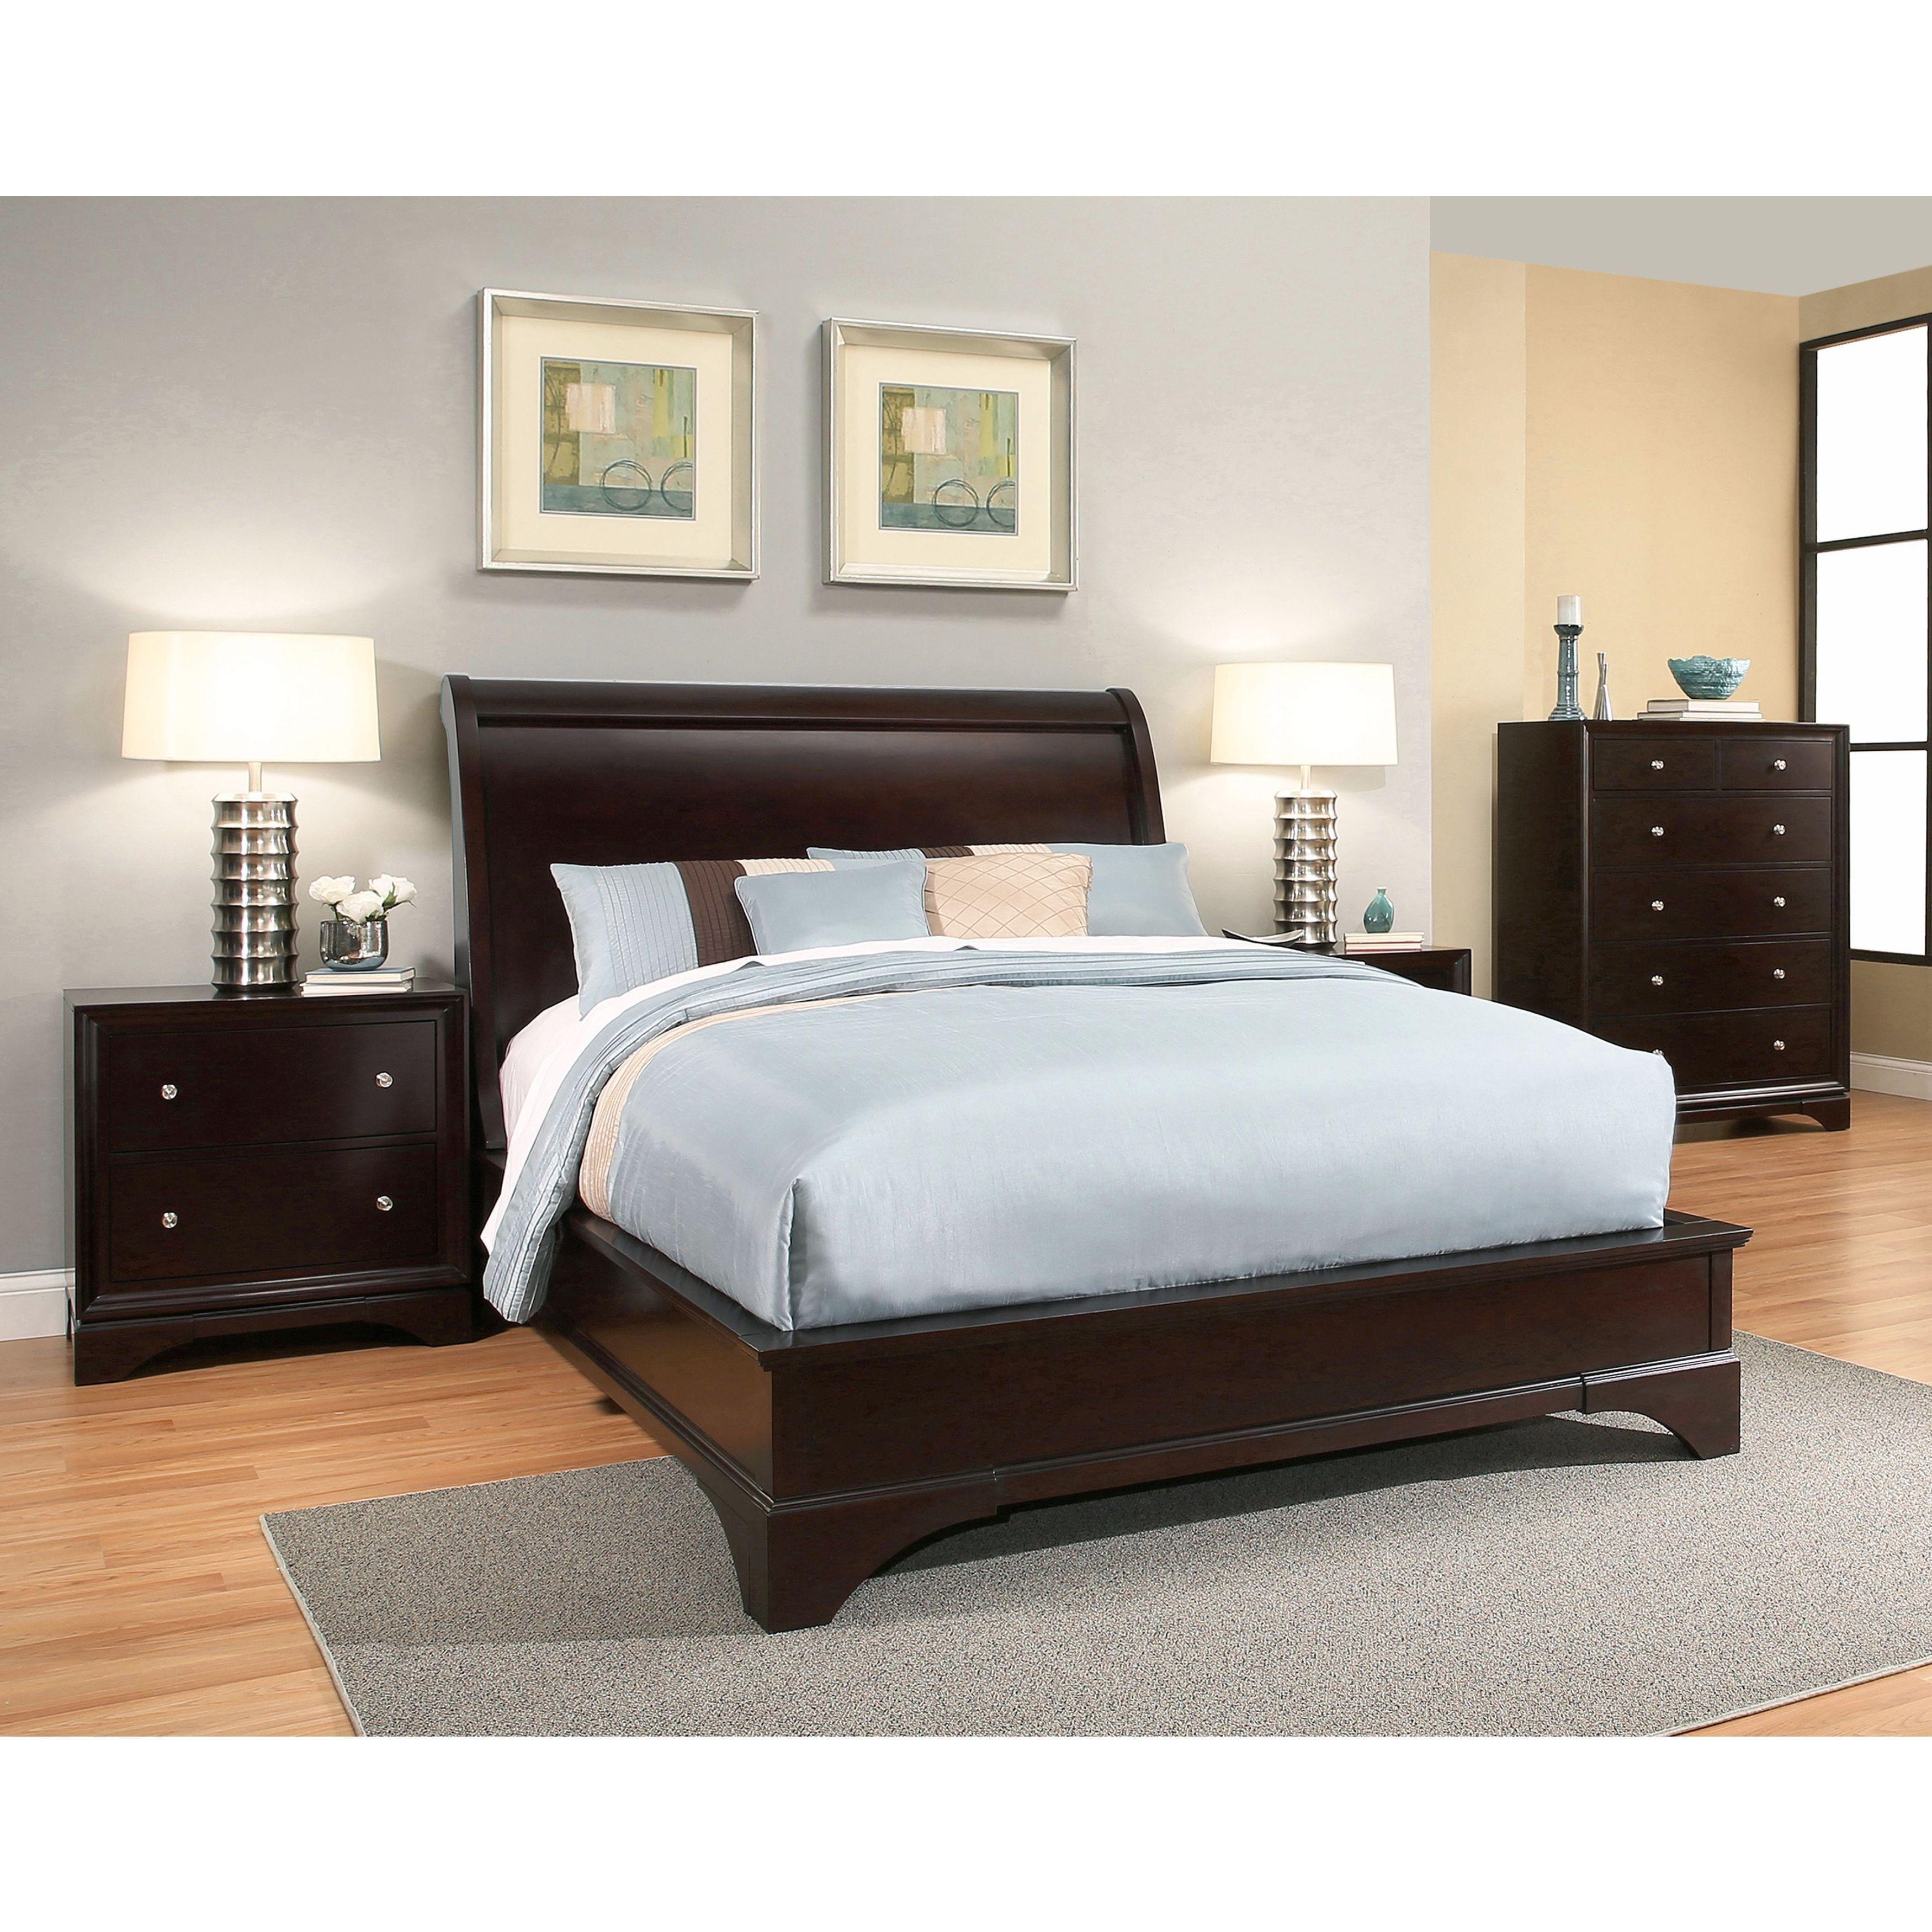 Abbyson Sydney Espresso Finish Wood Bed (California King), Brown